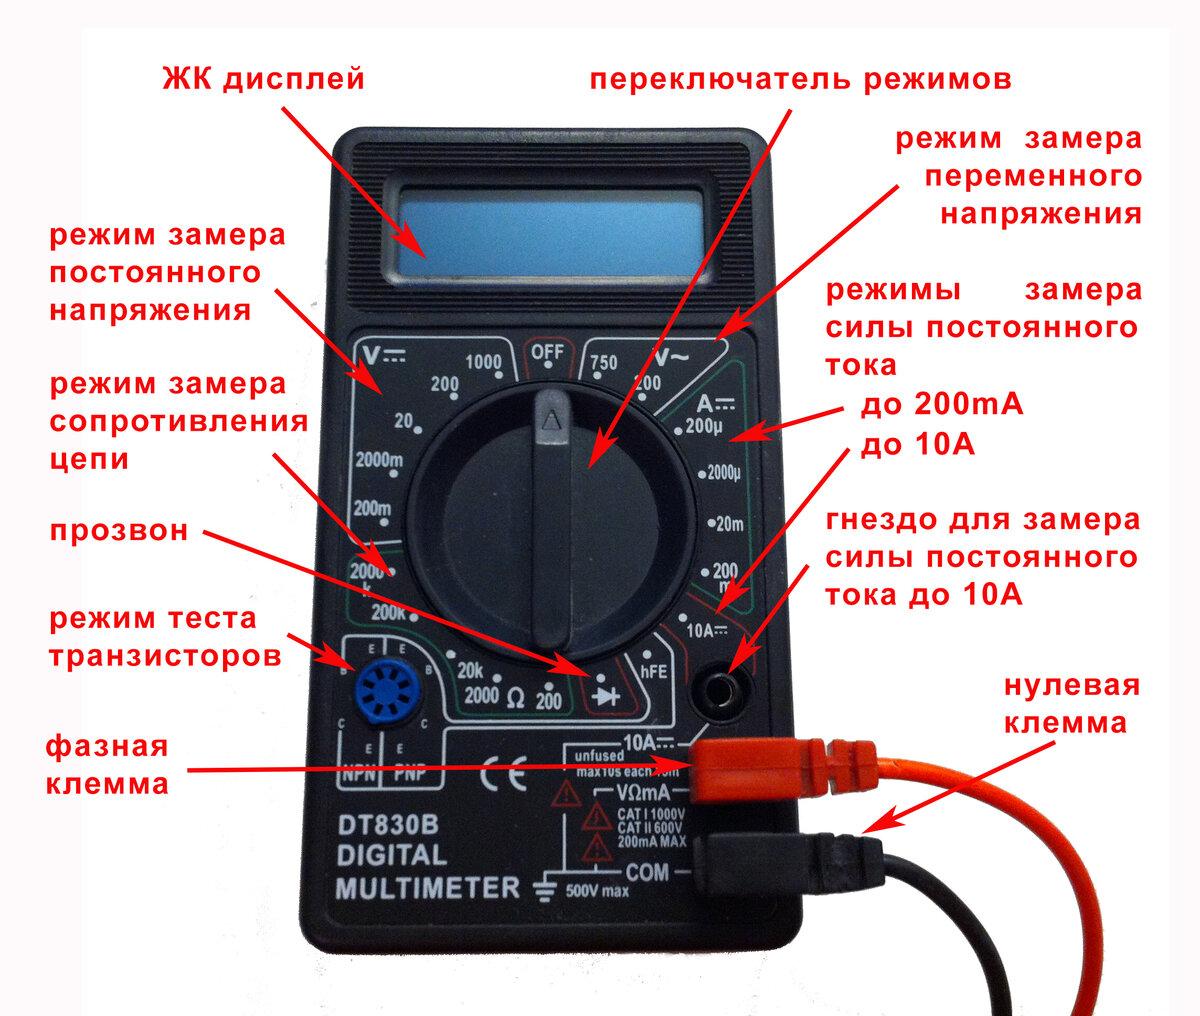 Как проверить аккумулятор фотоаппарата